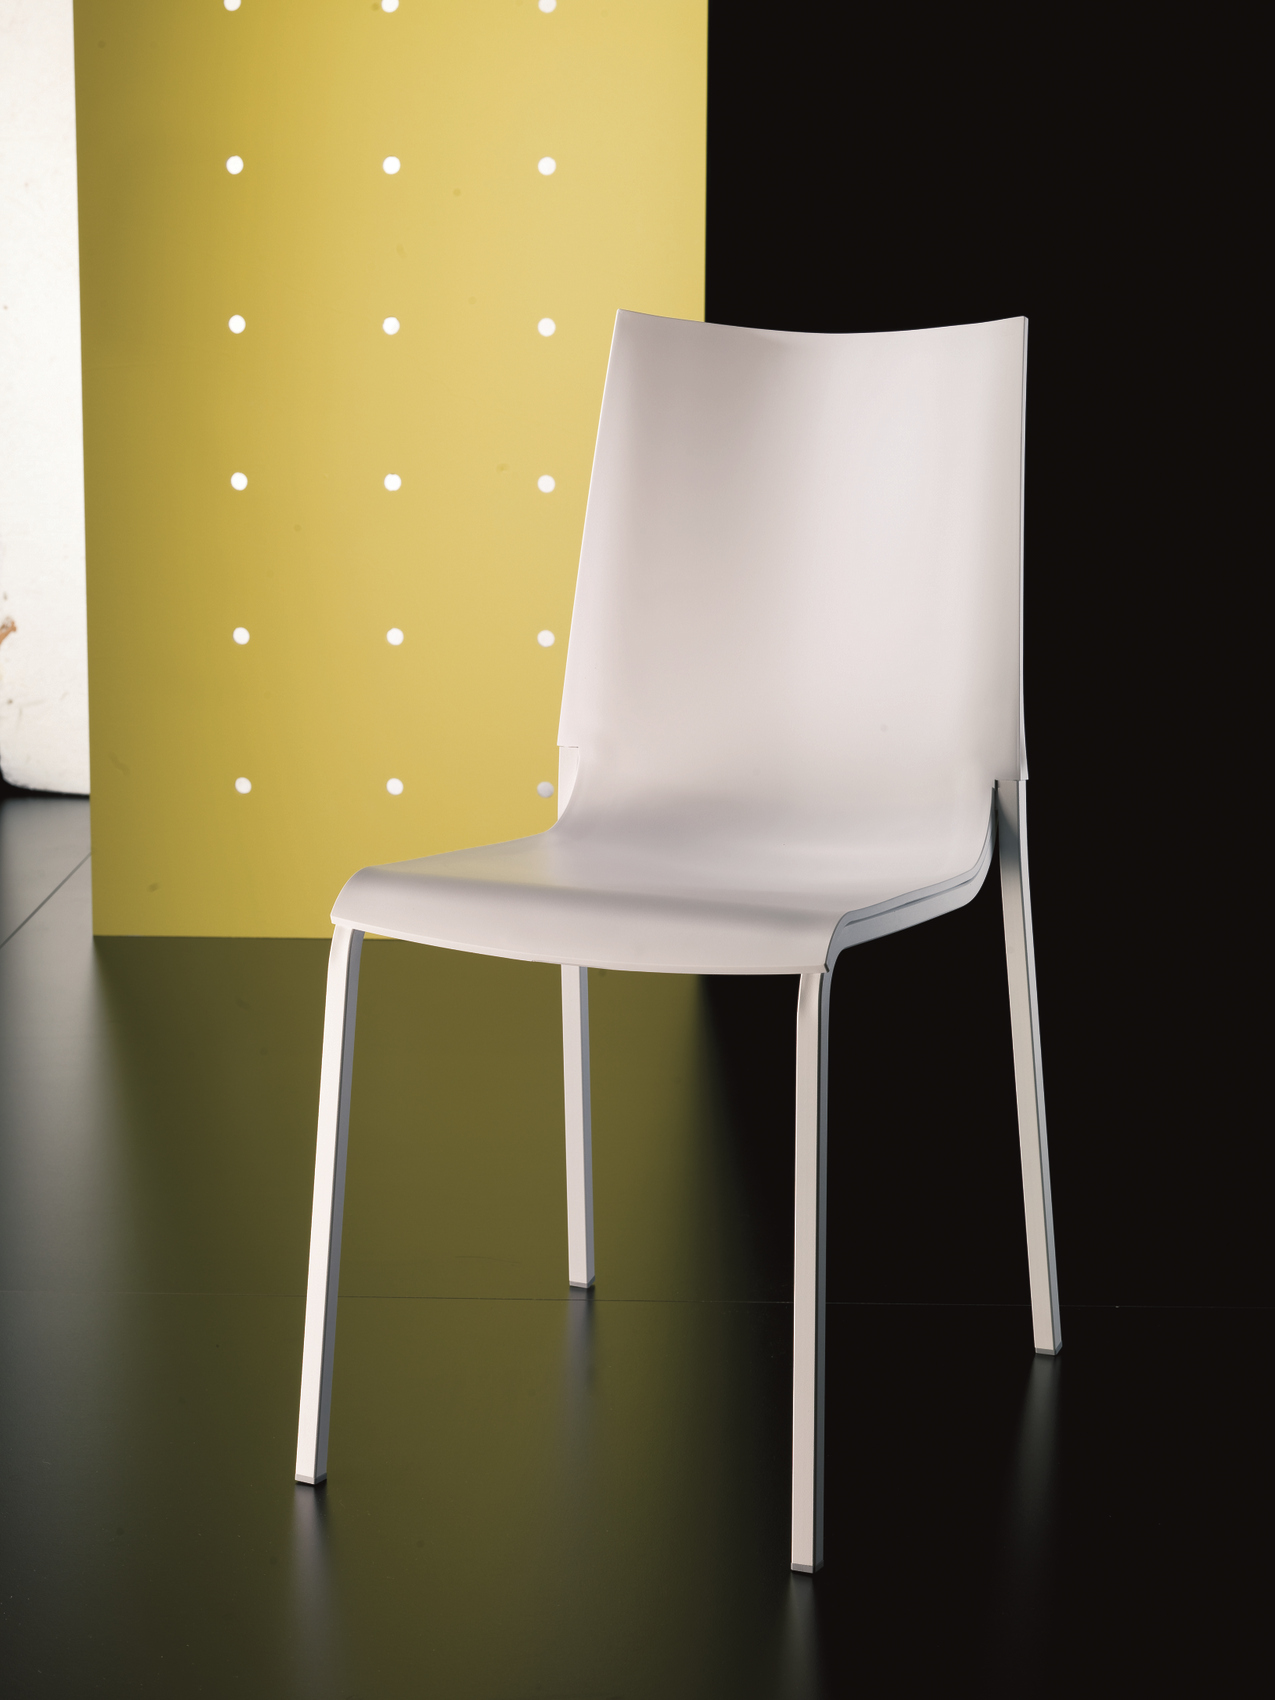 Sedia impilabile in plastica eva sedia in polipropilene collezione sedie by bontempi casa - Sedia polipropilene impilabile ...